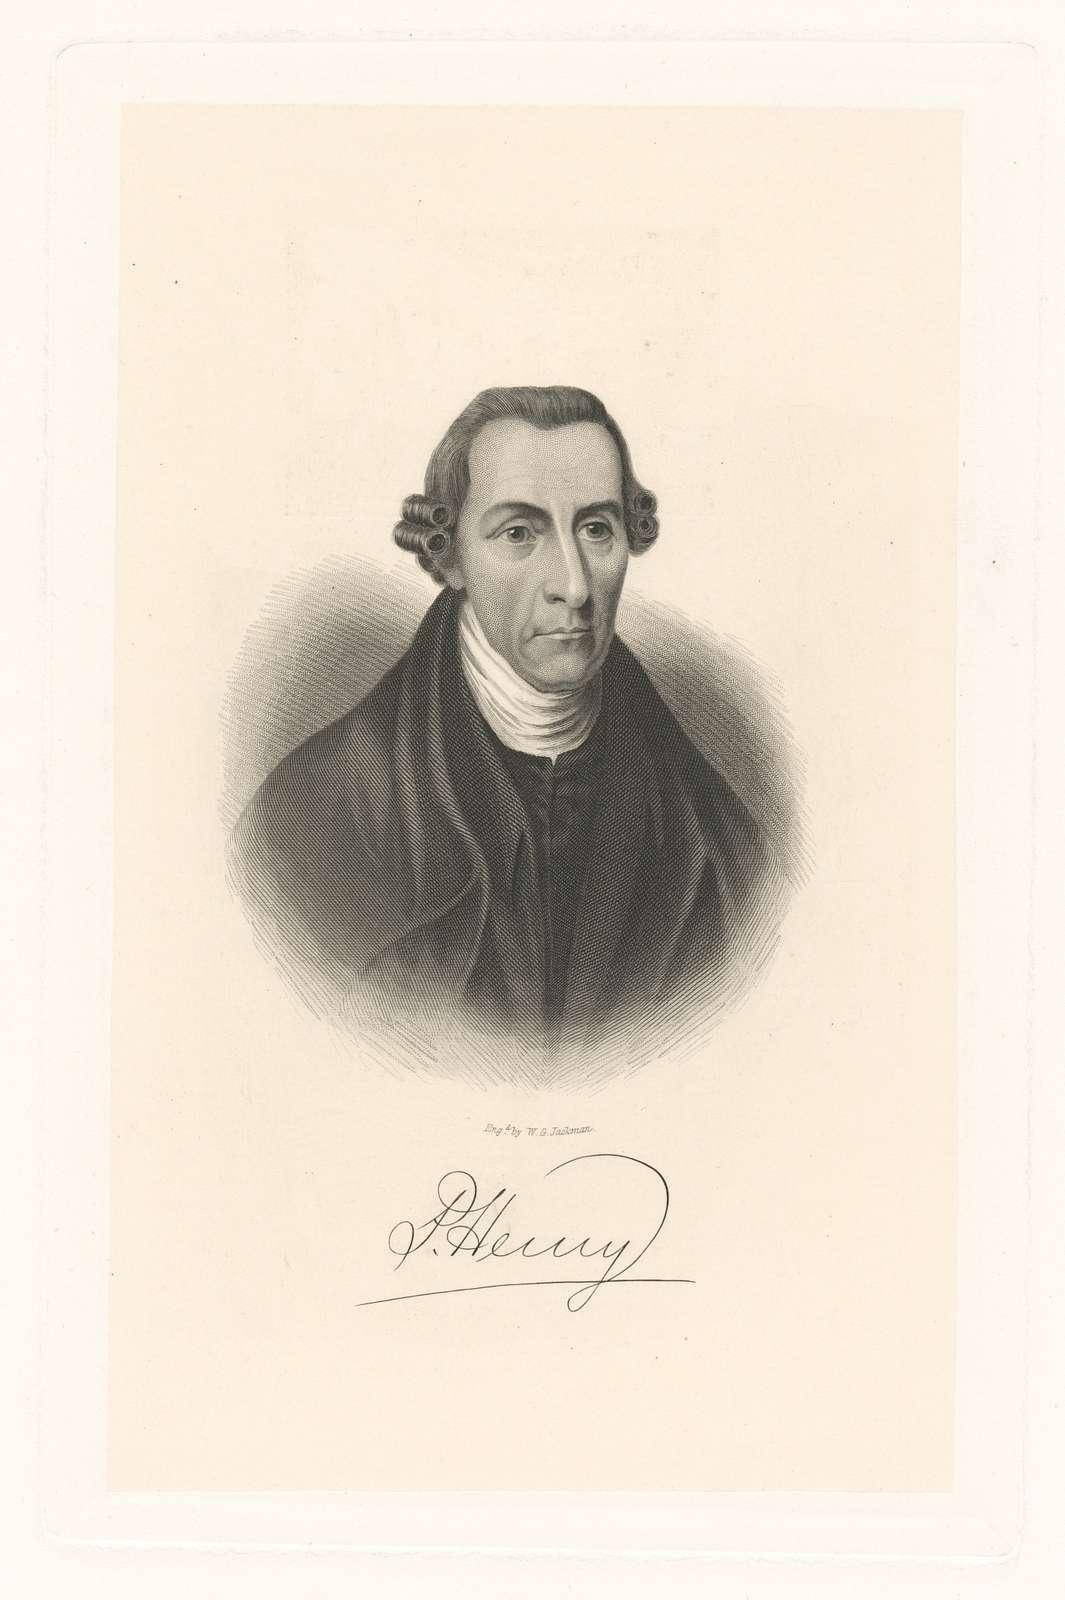 P. Henry.